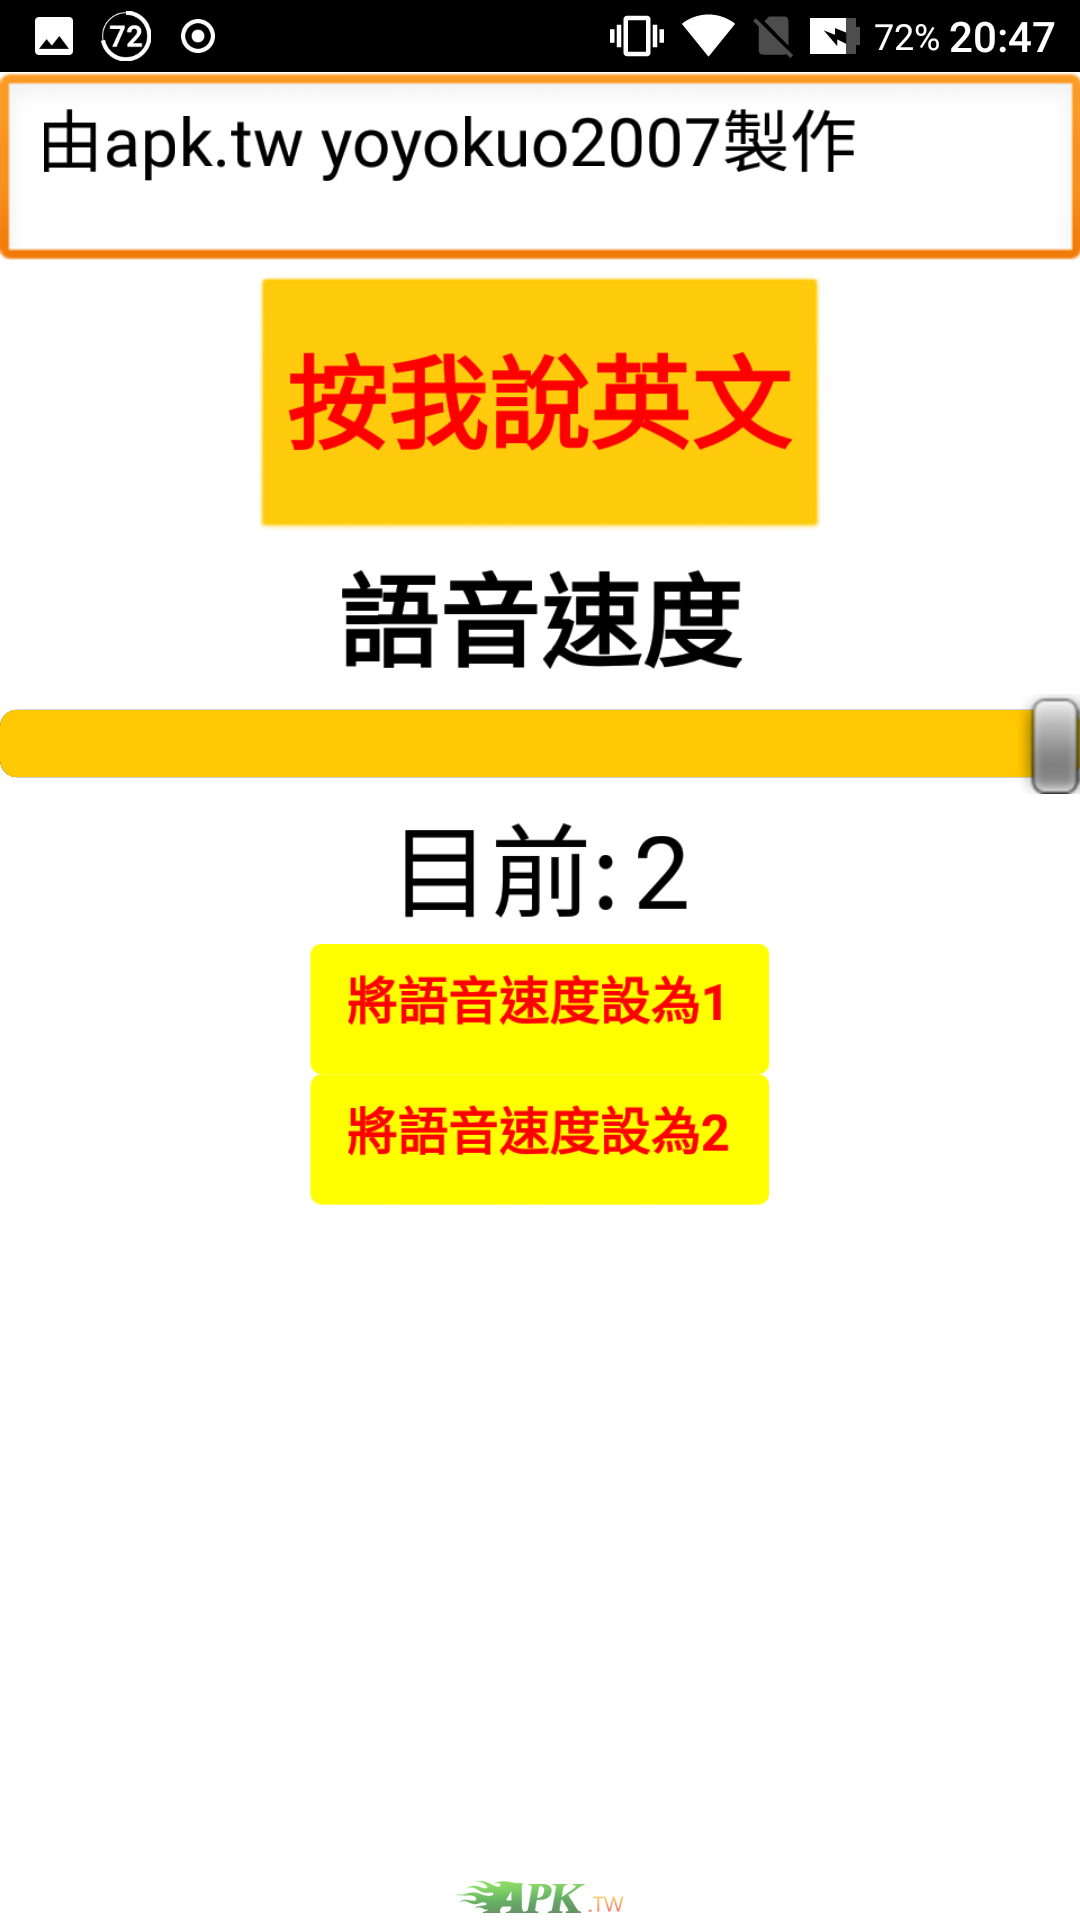 Screenshot_20190521-204743.png